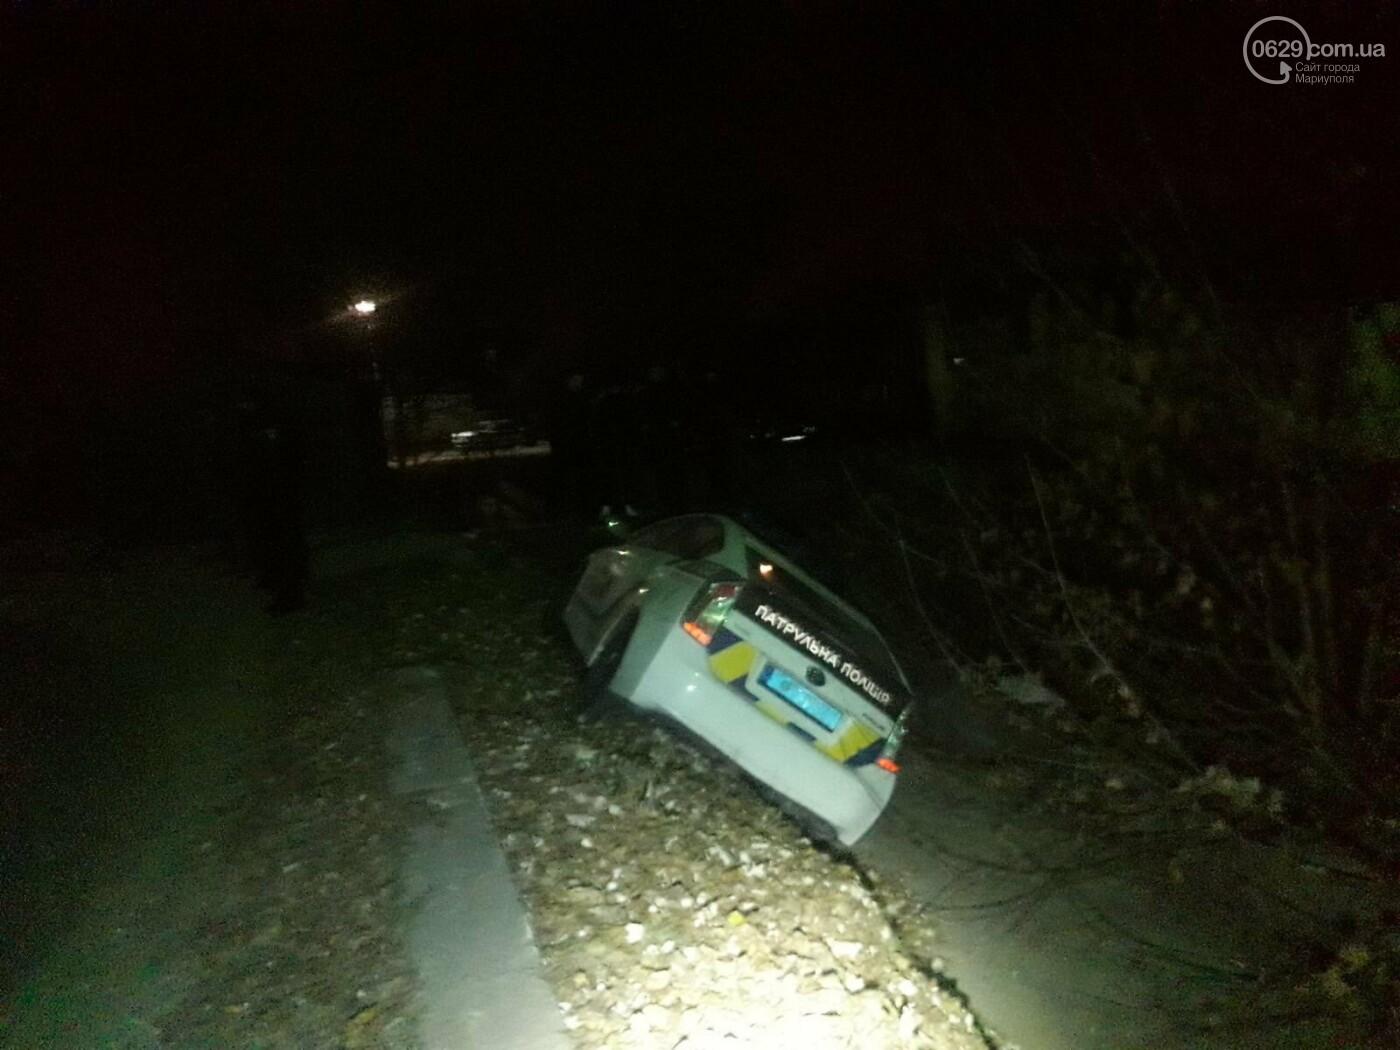 В Мариуполе полицейский автомобиль съехал в кювет,-ФОТО, фото-1